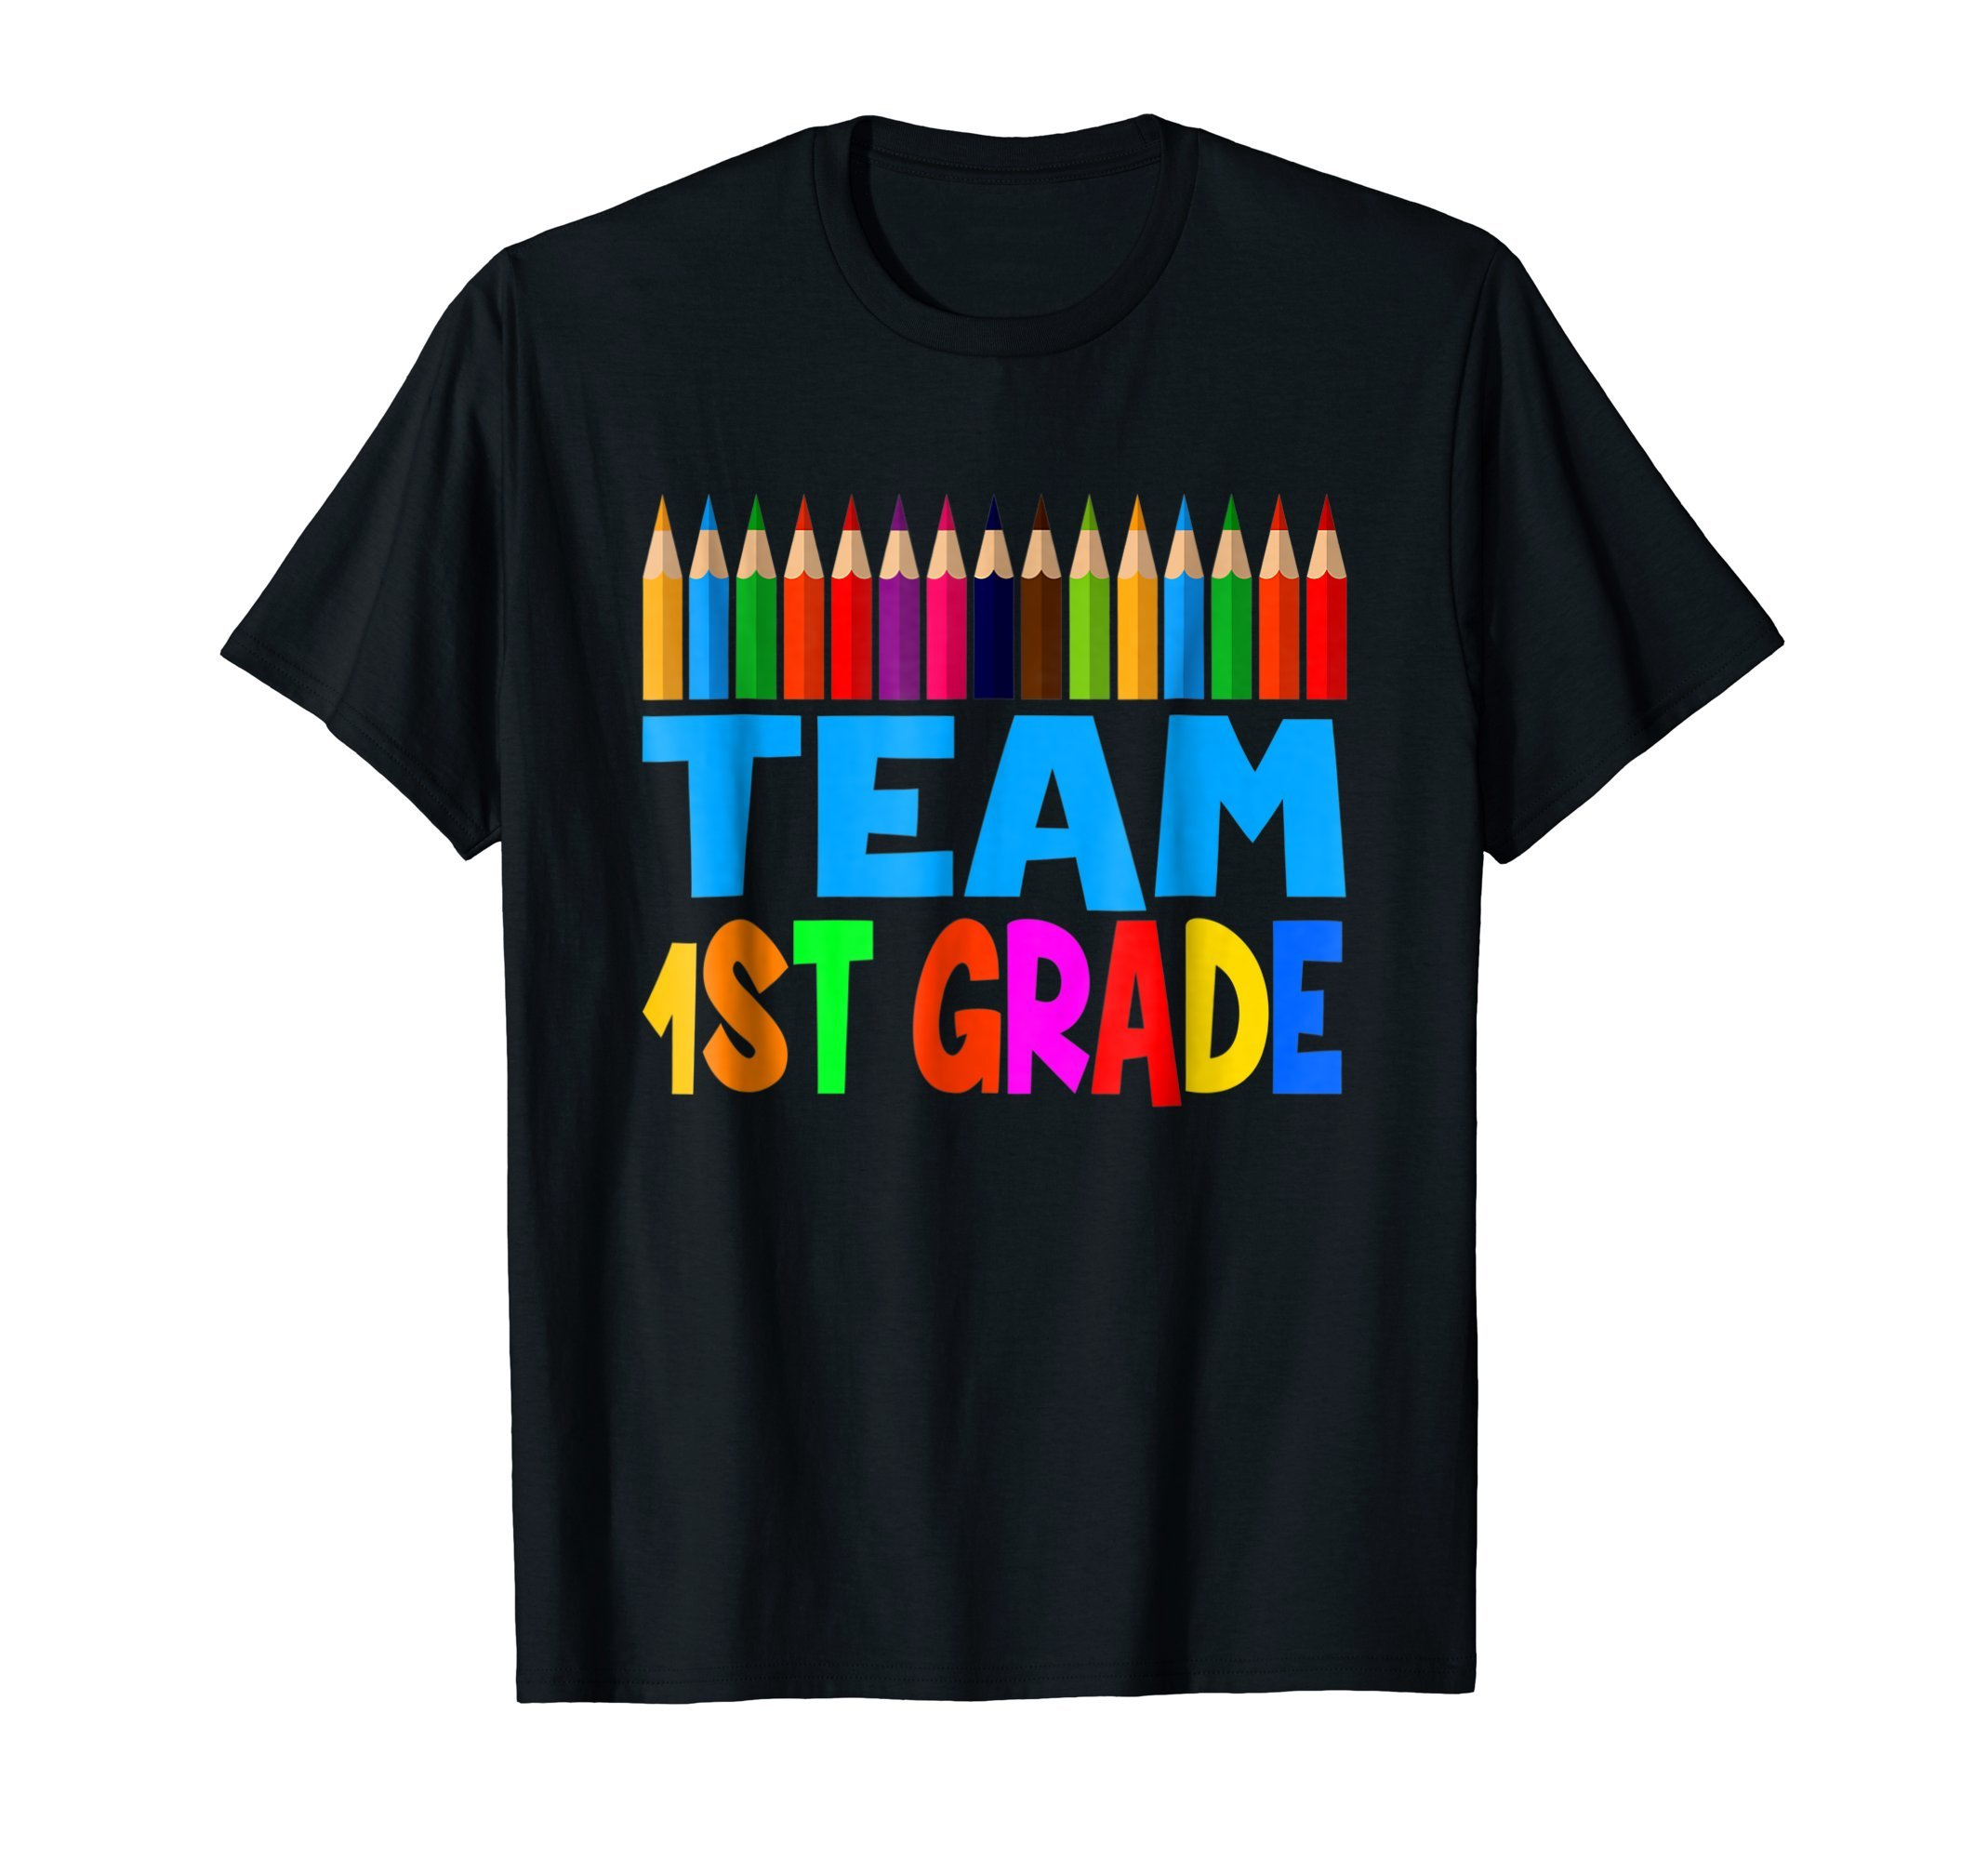 1st Grade Team Pencils Tshirts 1st Grade For Kids / Teachers